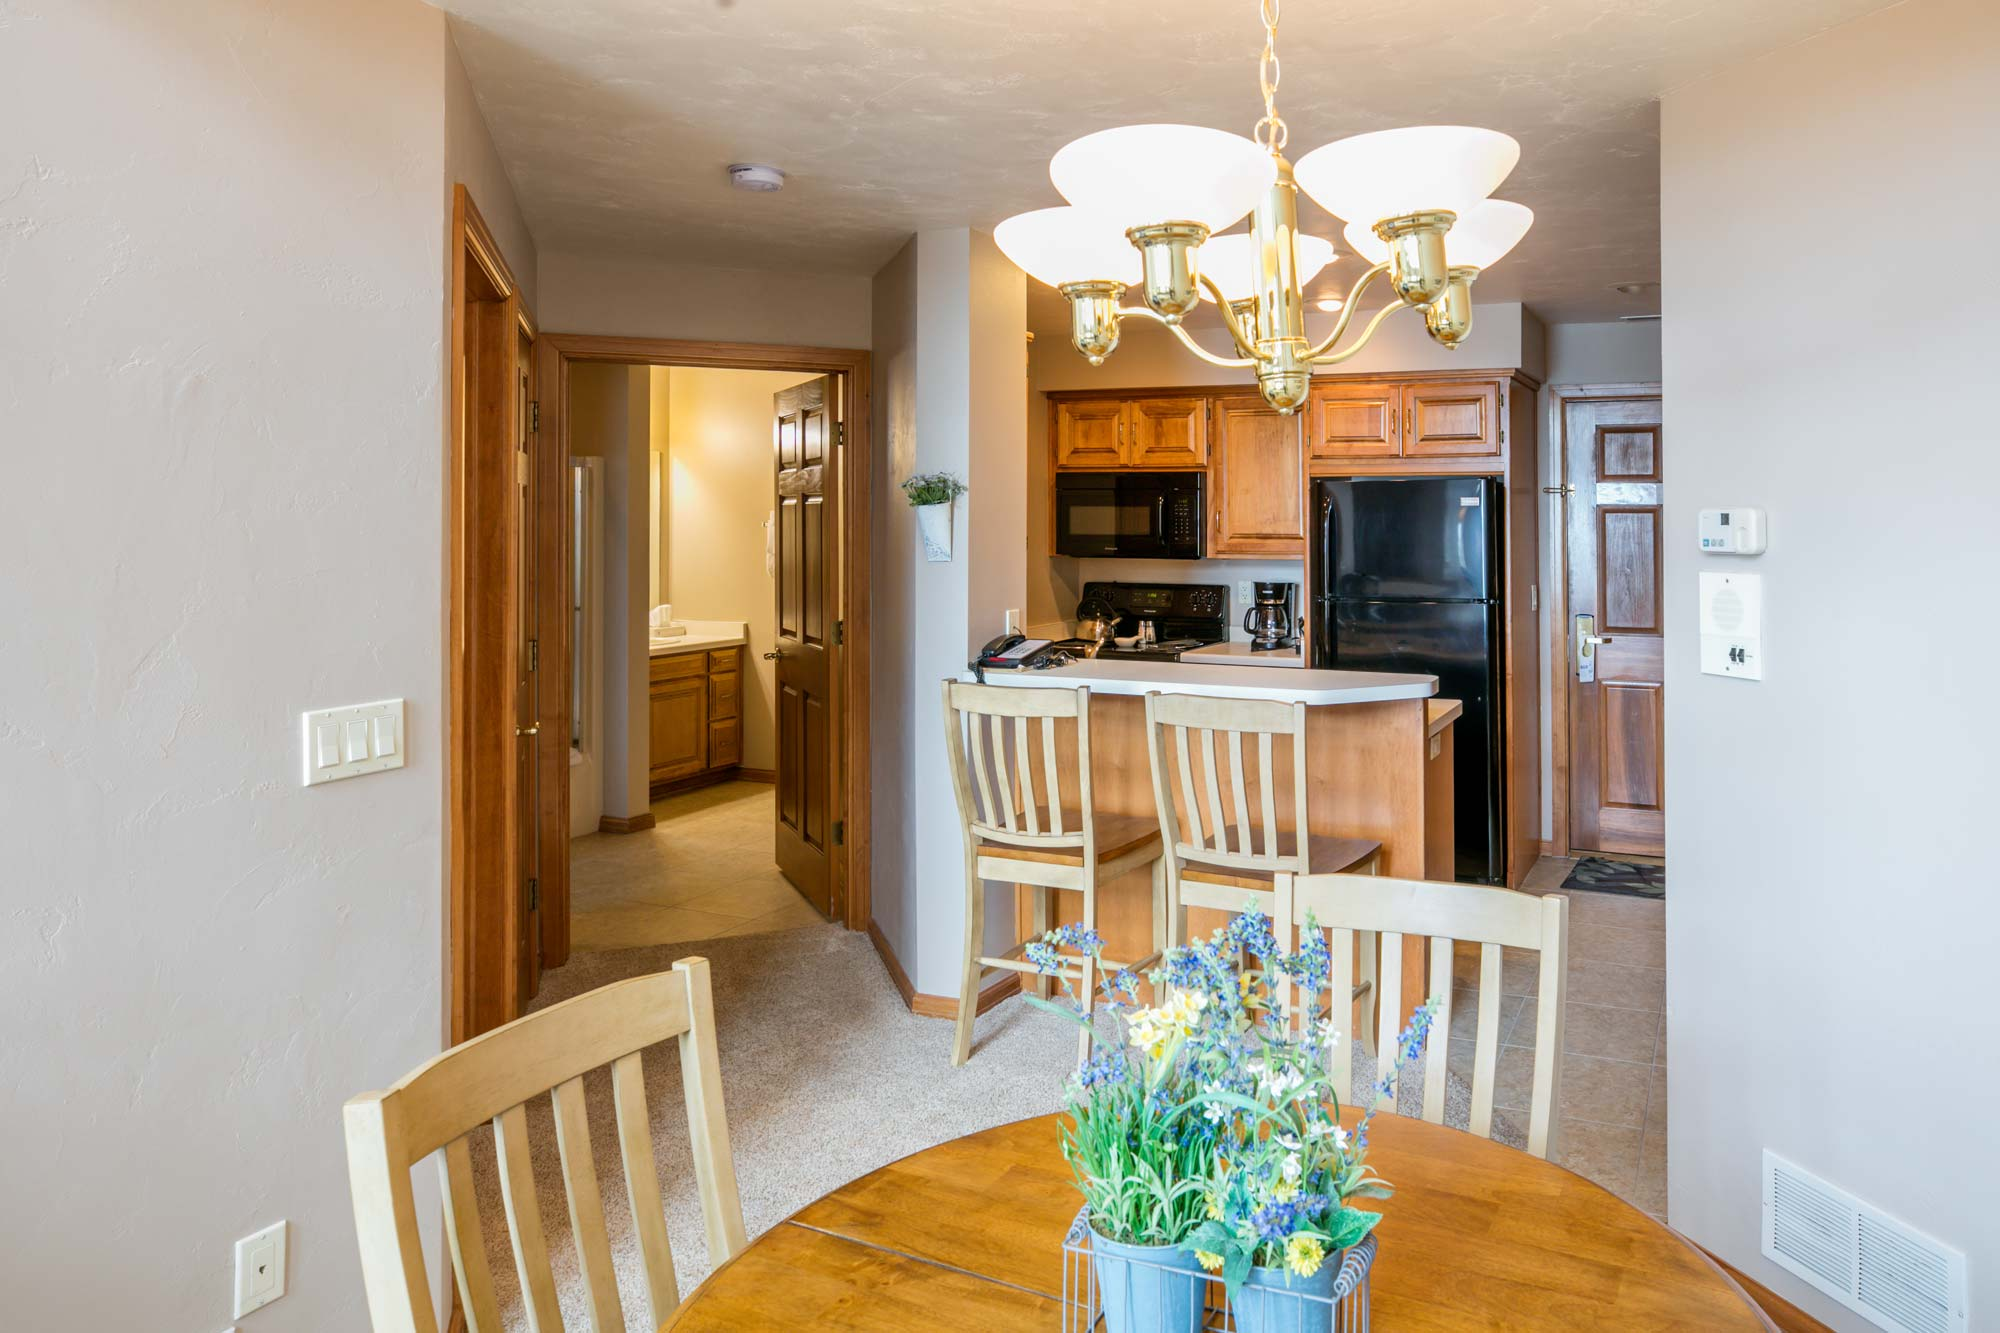 Kitchen at Vacation Rental and Resort in Door County, Wisconsin